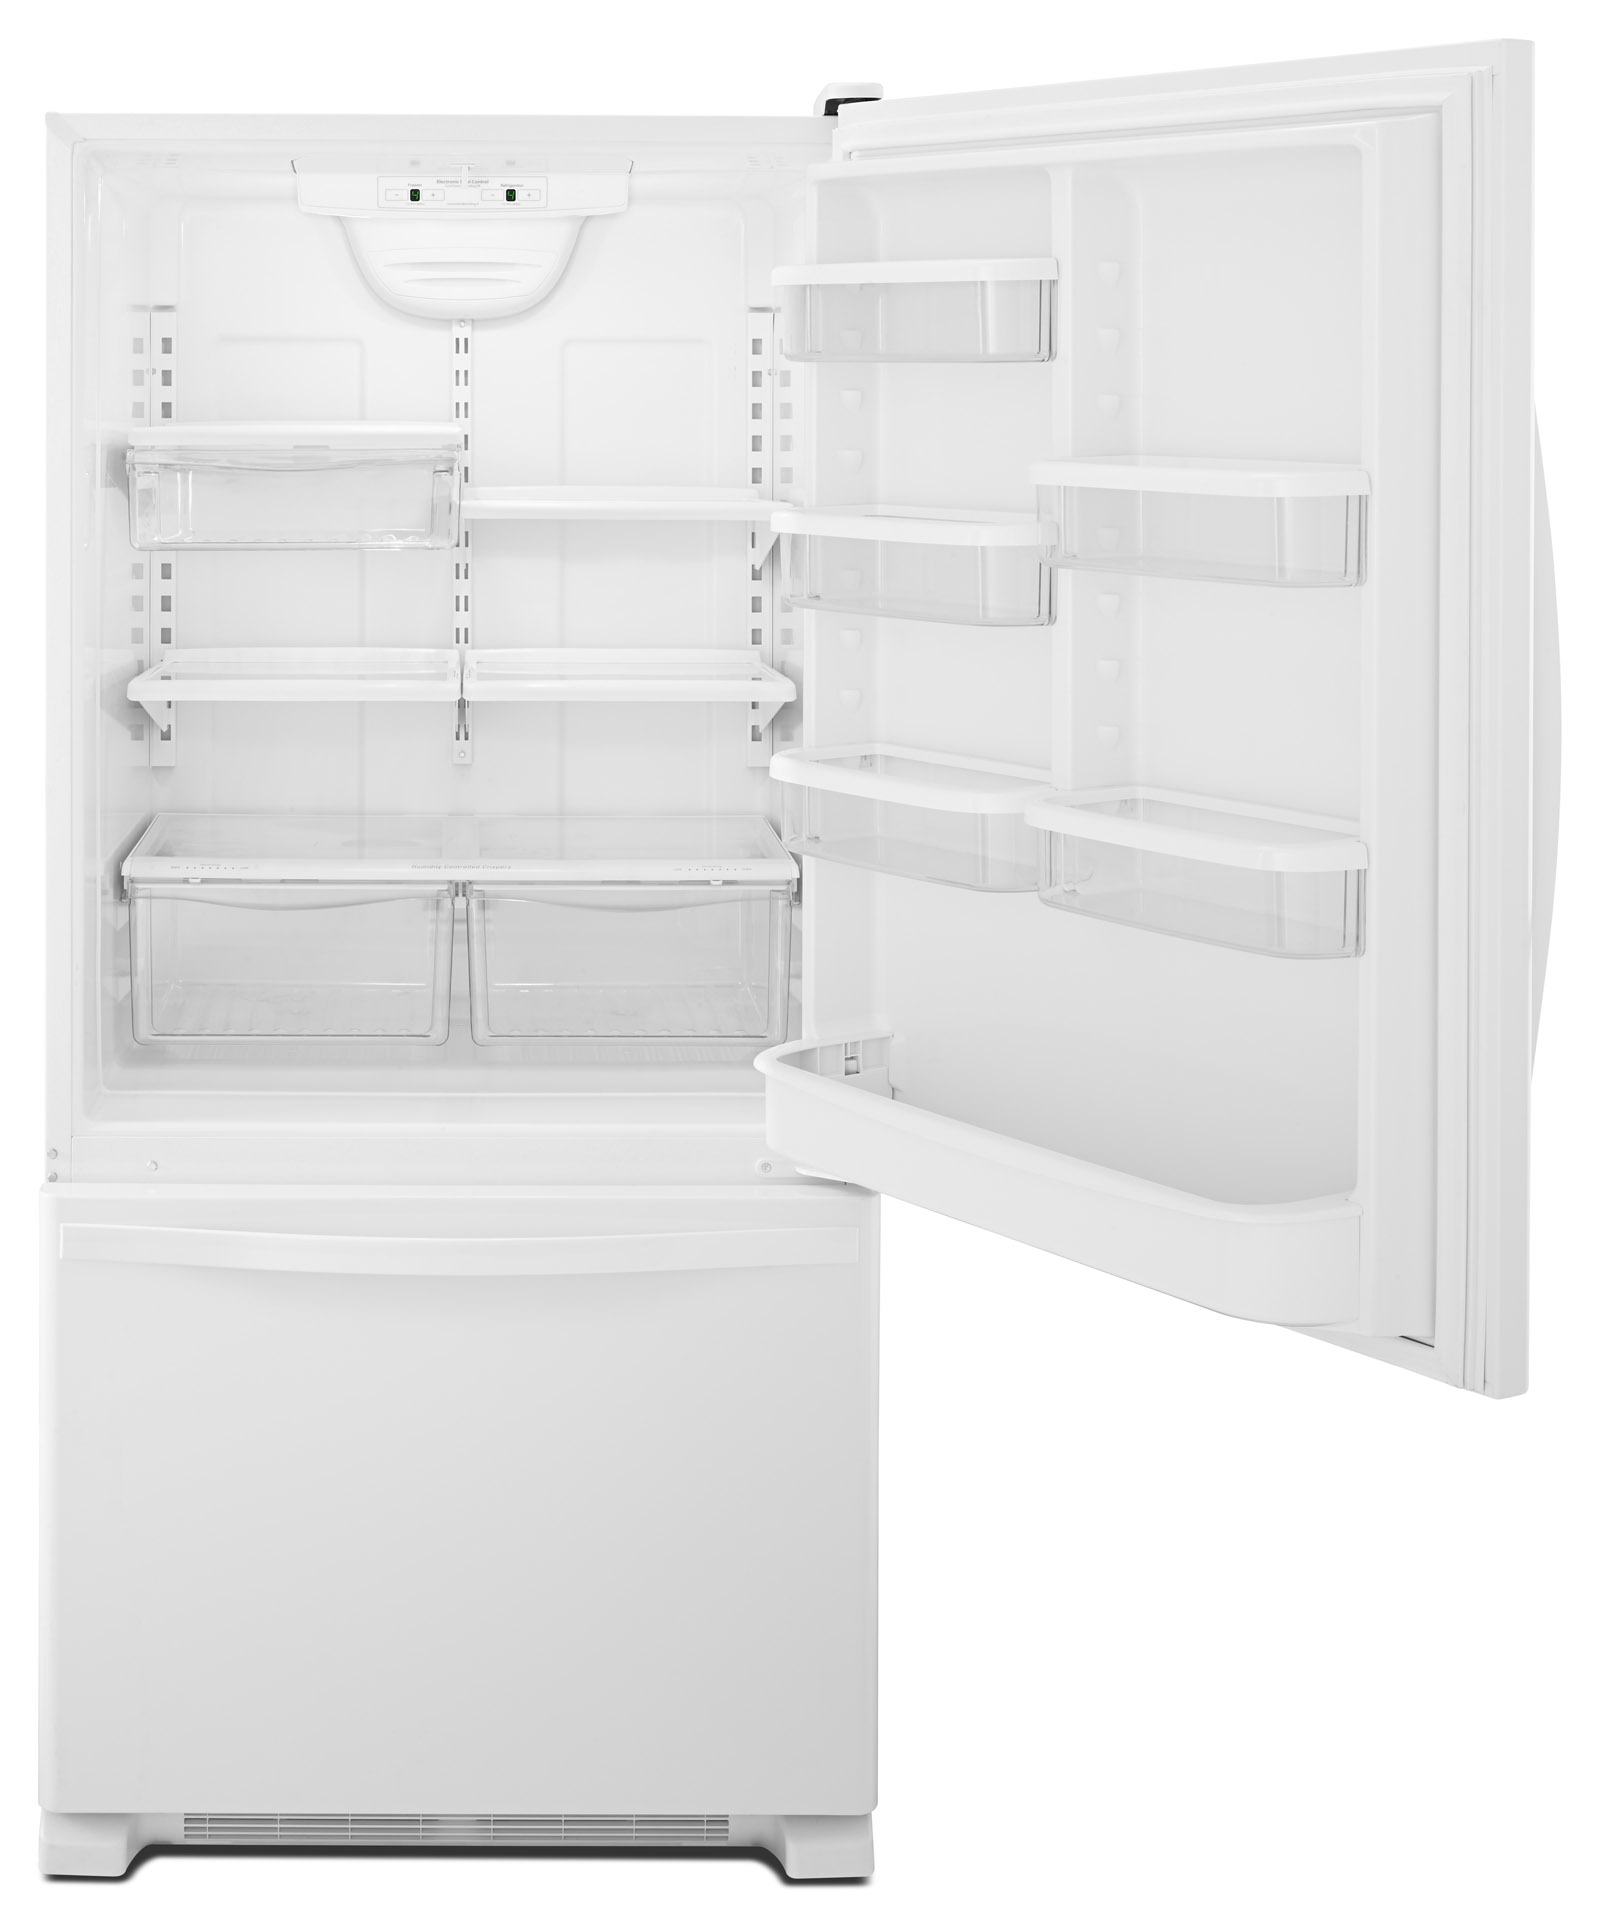 Whirlpool WRB329DMBW 19 cu. ft. Single Door Bottom Freezer Refrigerator w/ Adaptive Defrost - White